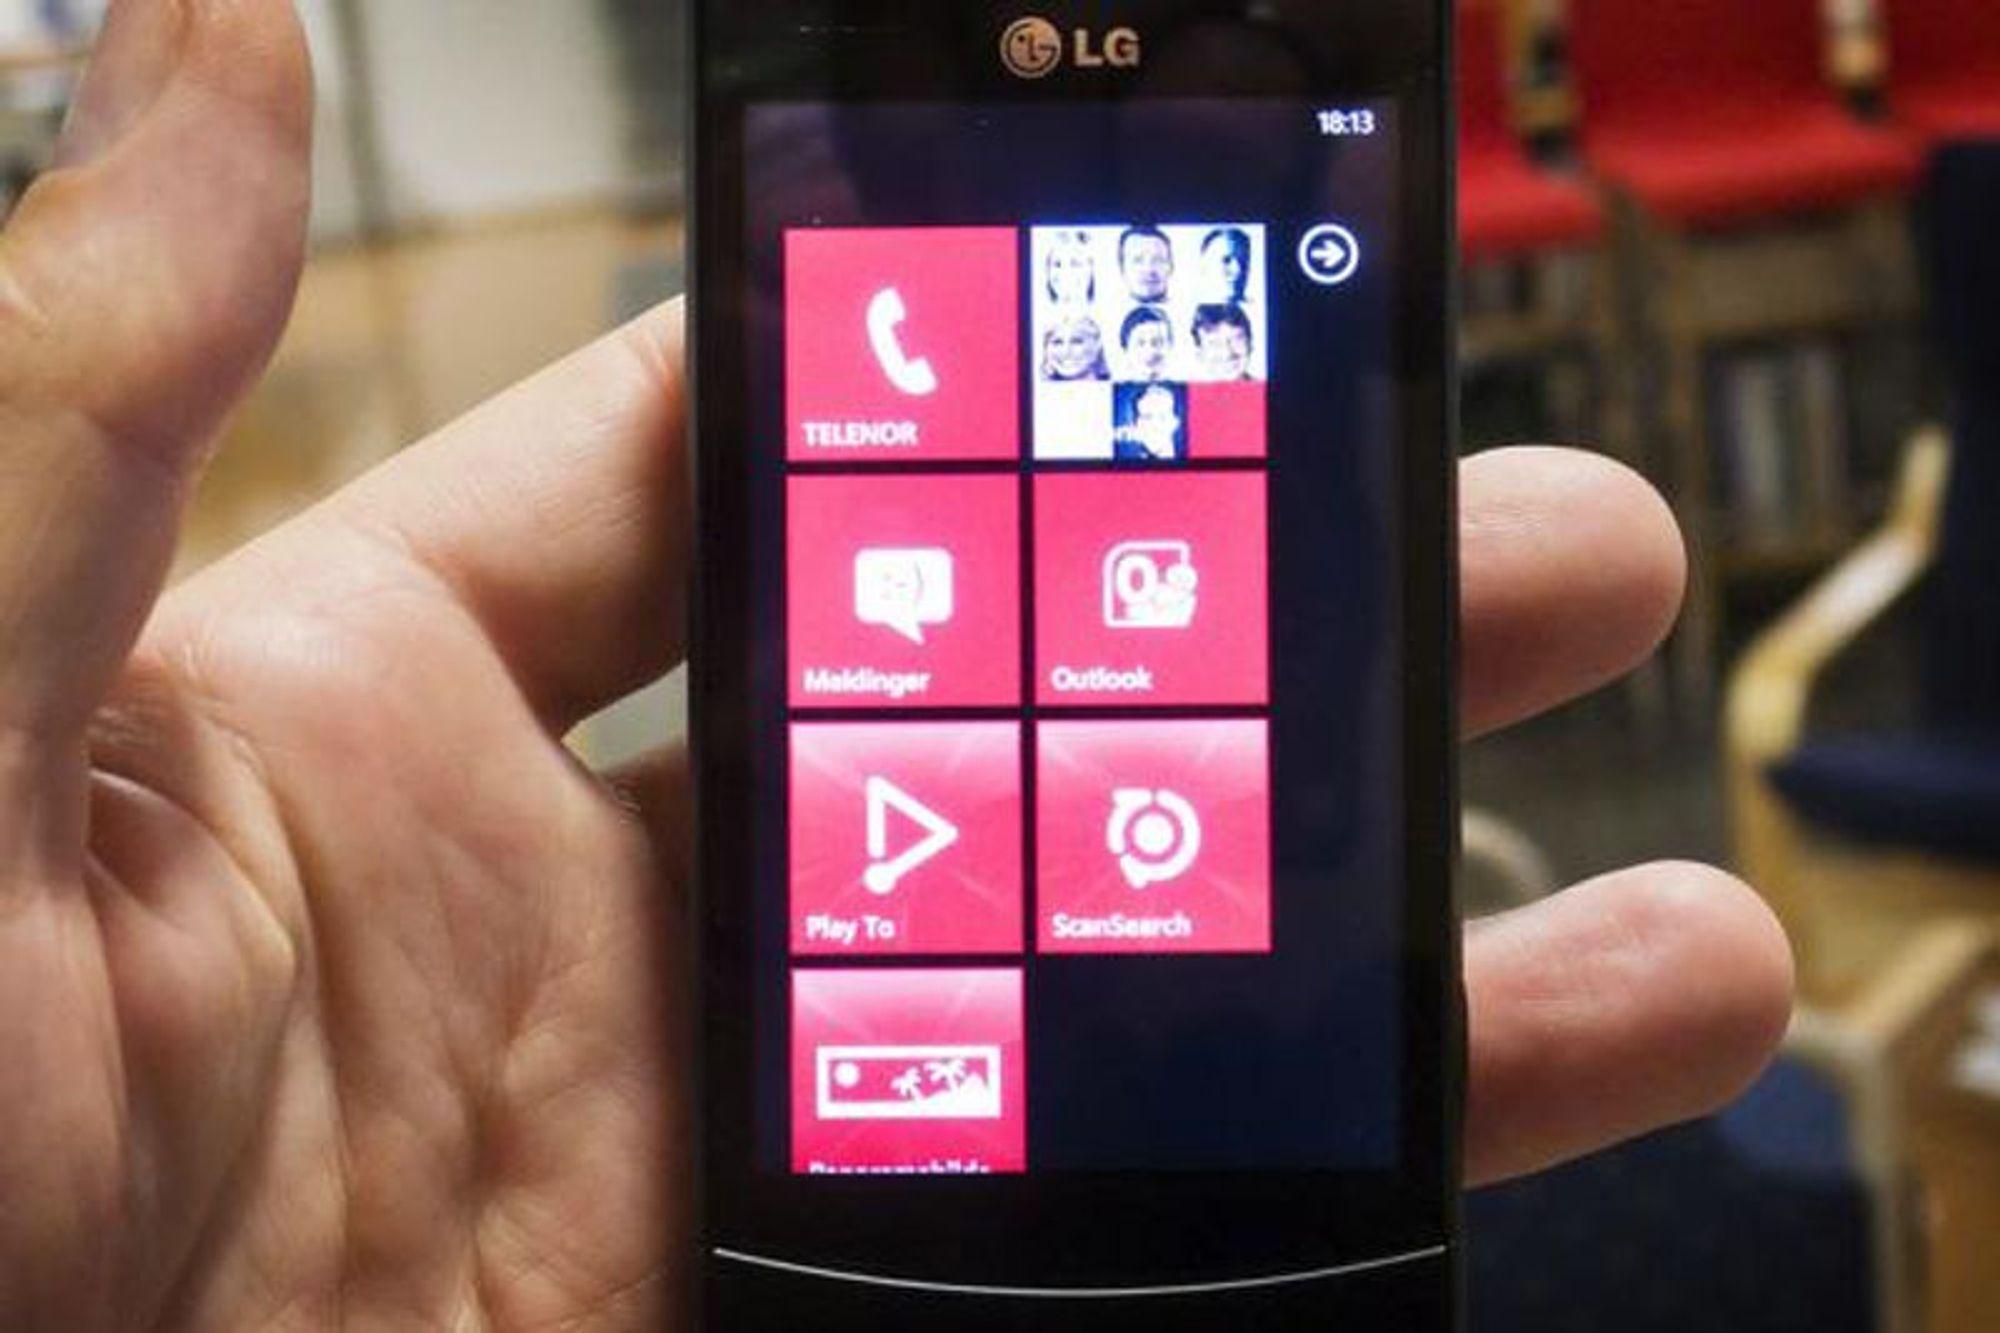 Friskmelder Windows Phone Marketplace